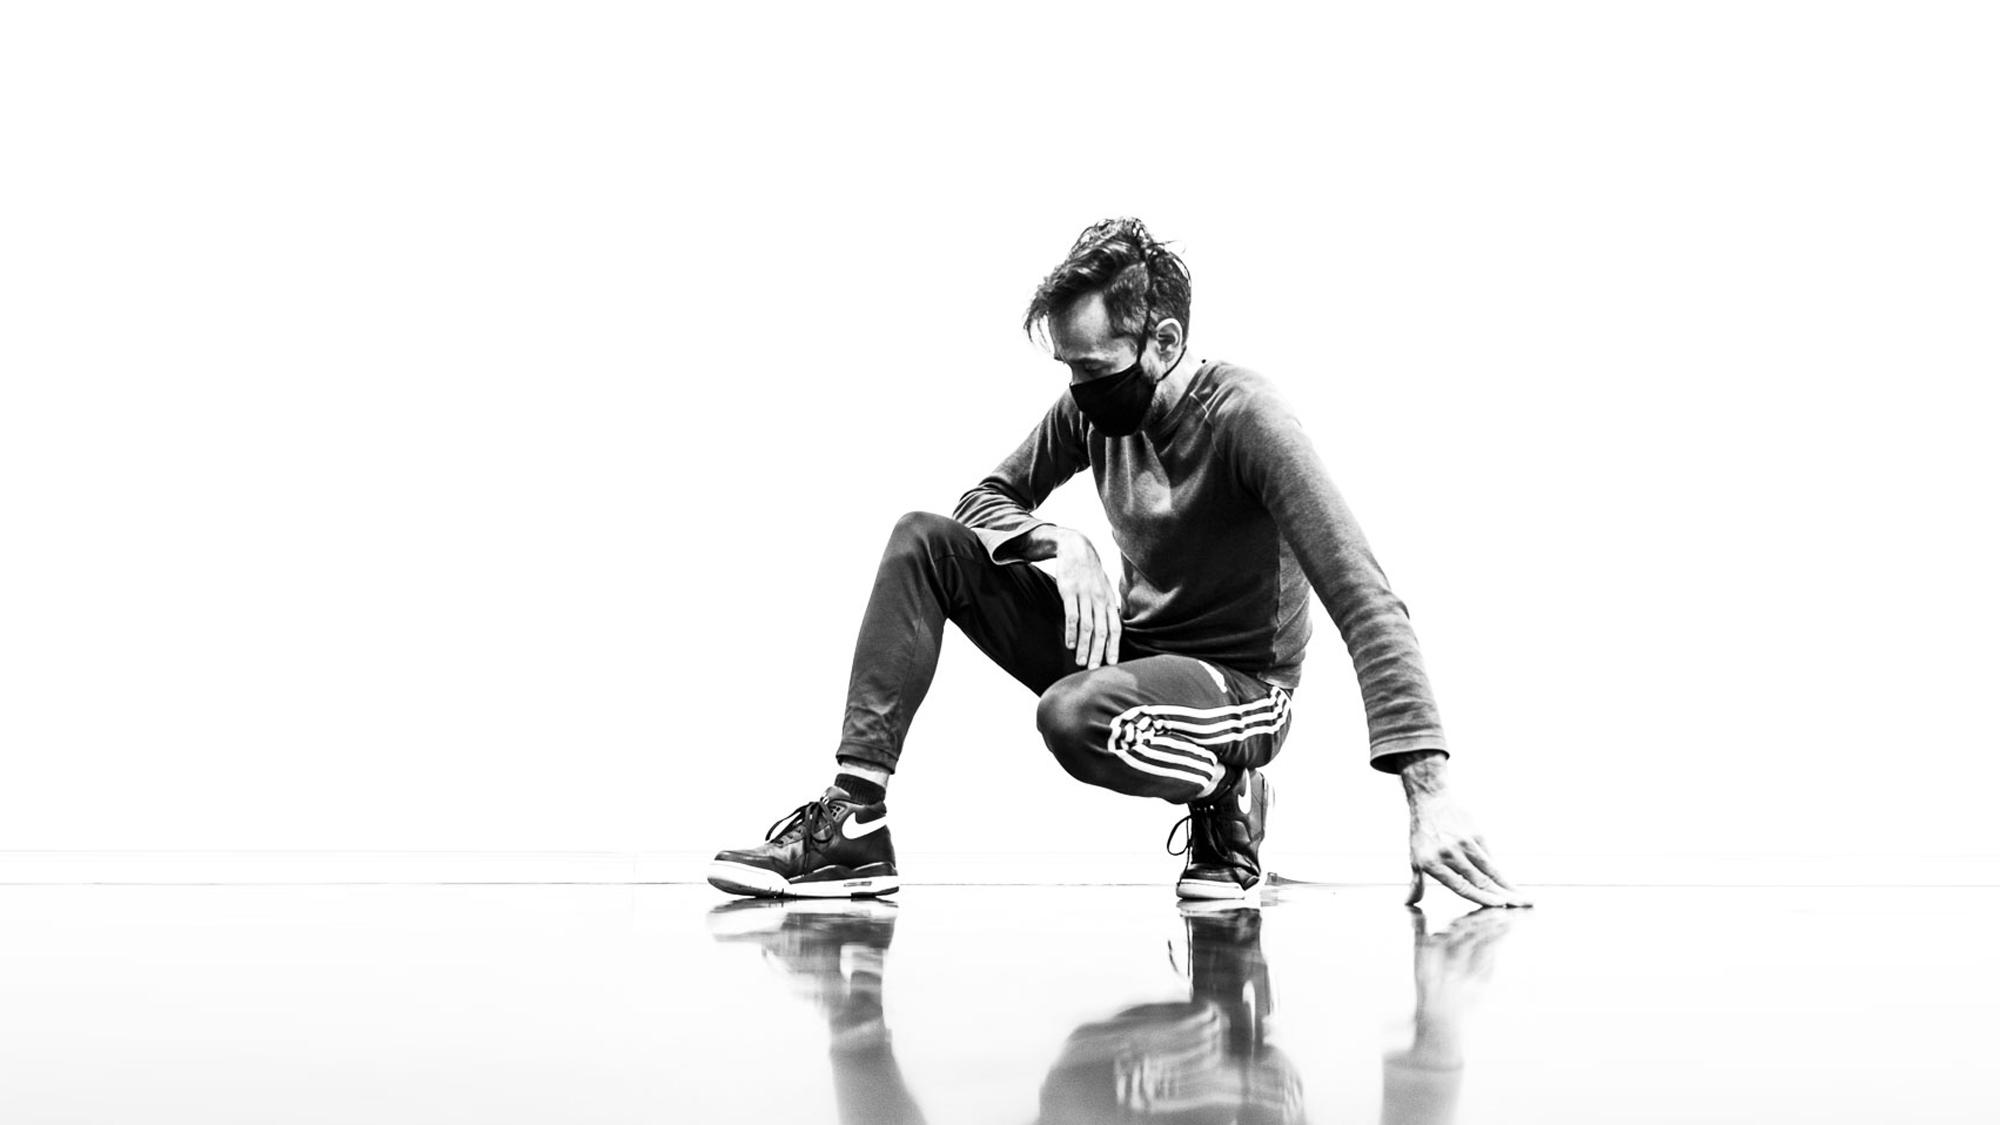 Photo © Jean-Christophe Yacono. Dancer Frédérick Gravel